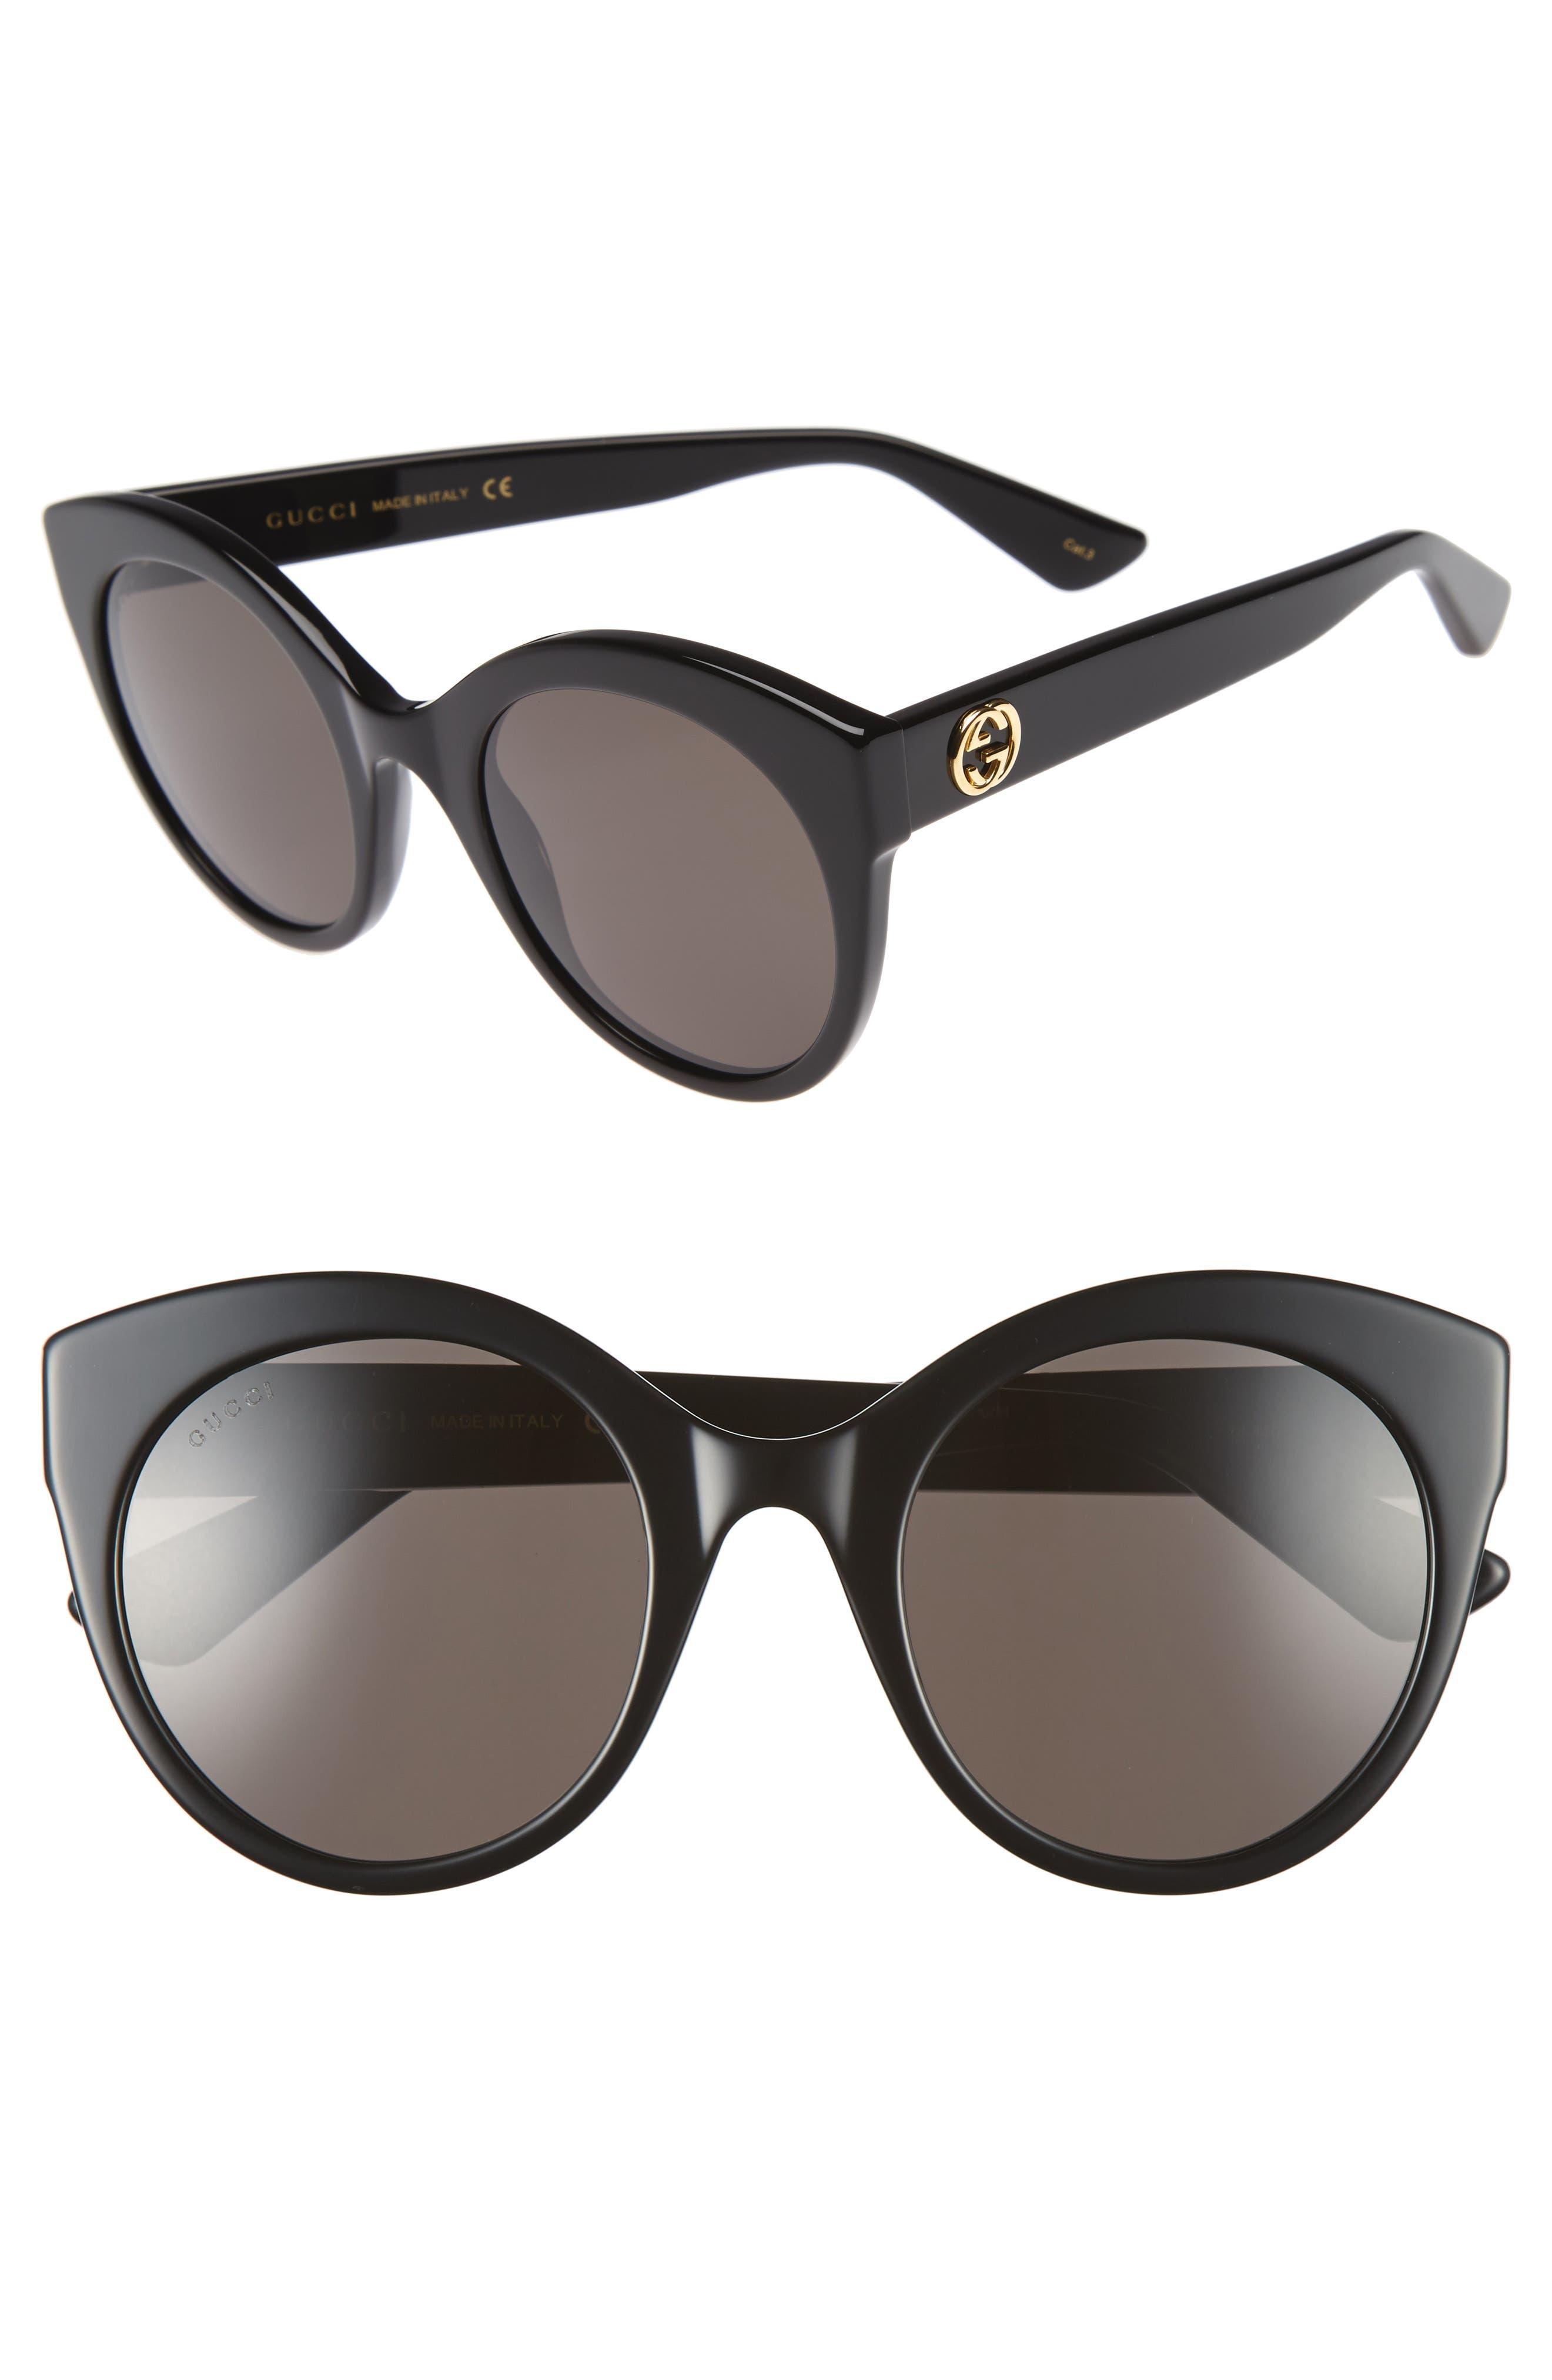 52mm Cat Eye Sunglasses,                             Main thumbnail 1, color,                             001